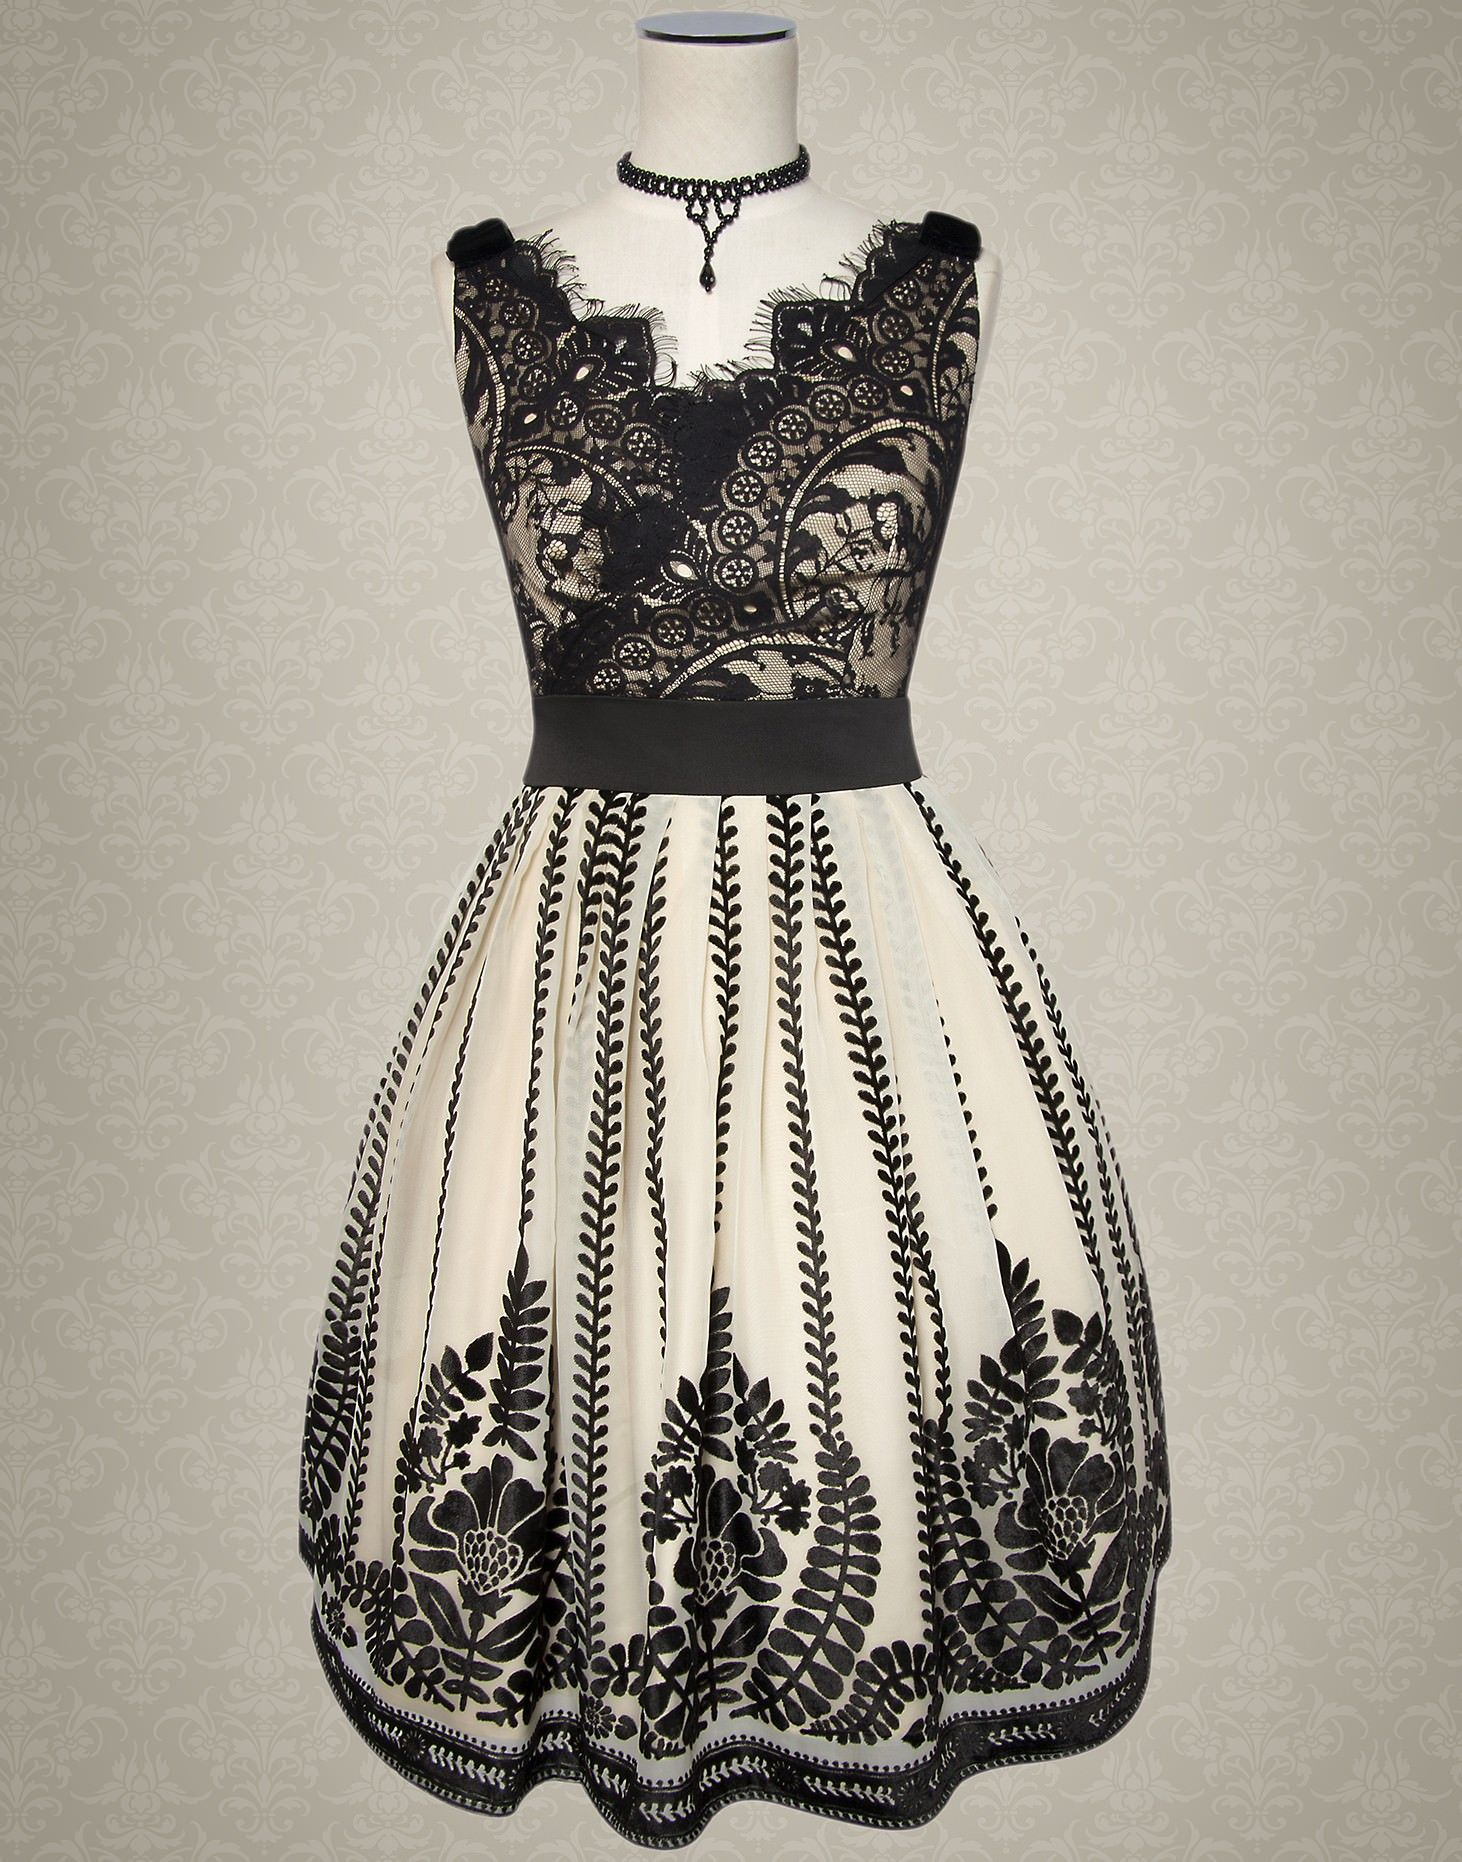 Notre Dame Dress - Kitten D'Amour - new vintage pinup rockabilly ...